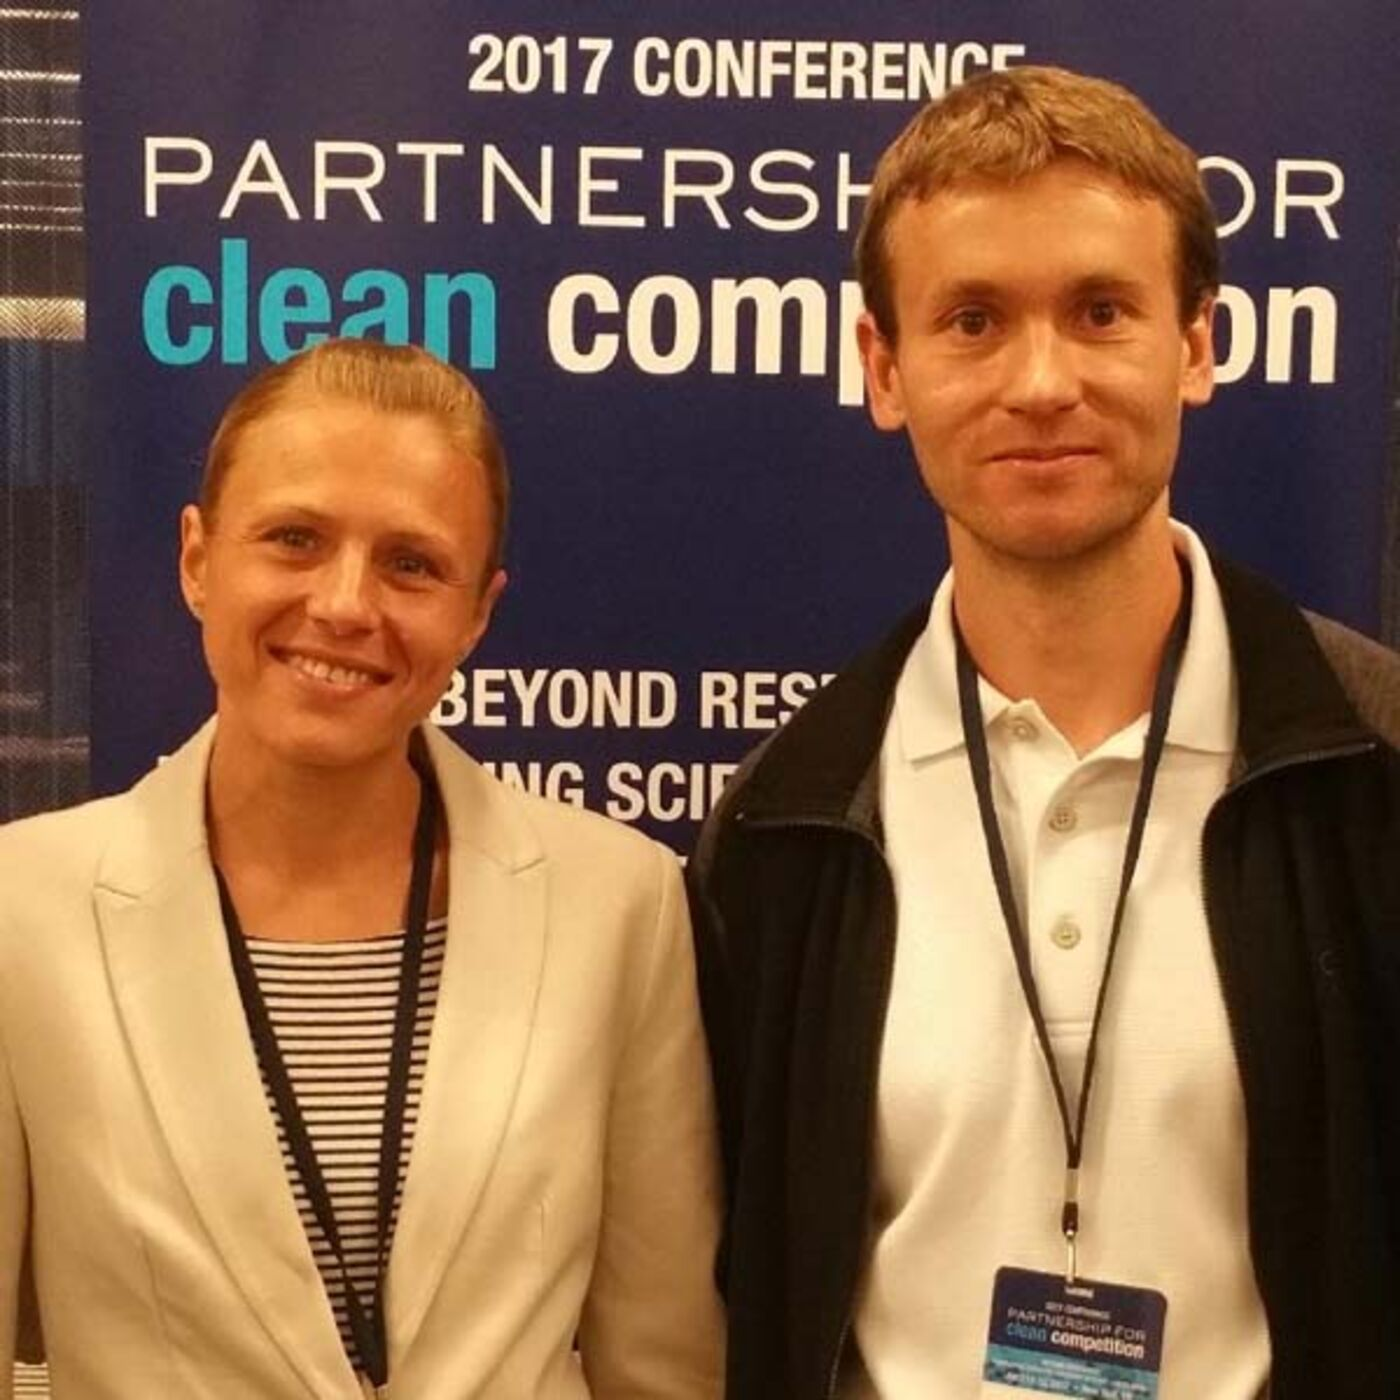 Ep 250 - Russian doping whistleblowers Yuliya and Vitaly Stepanov (Part 2)